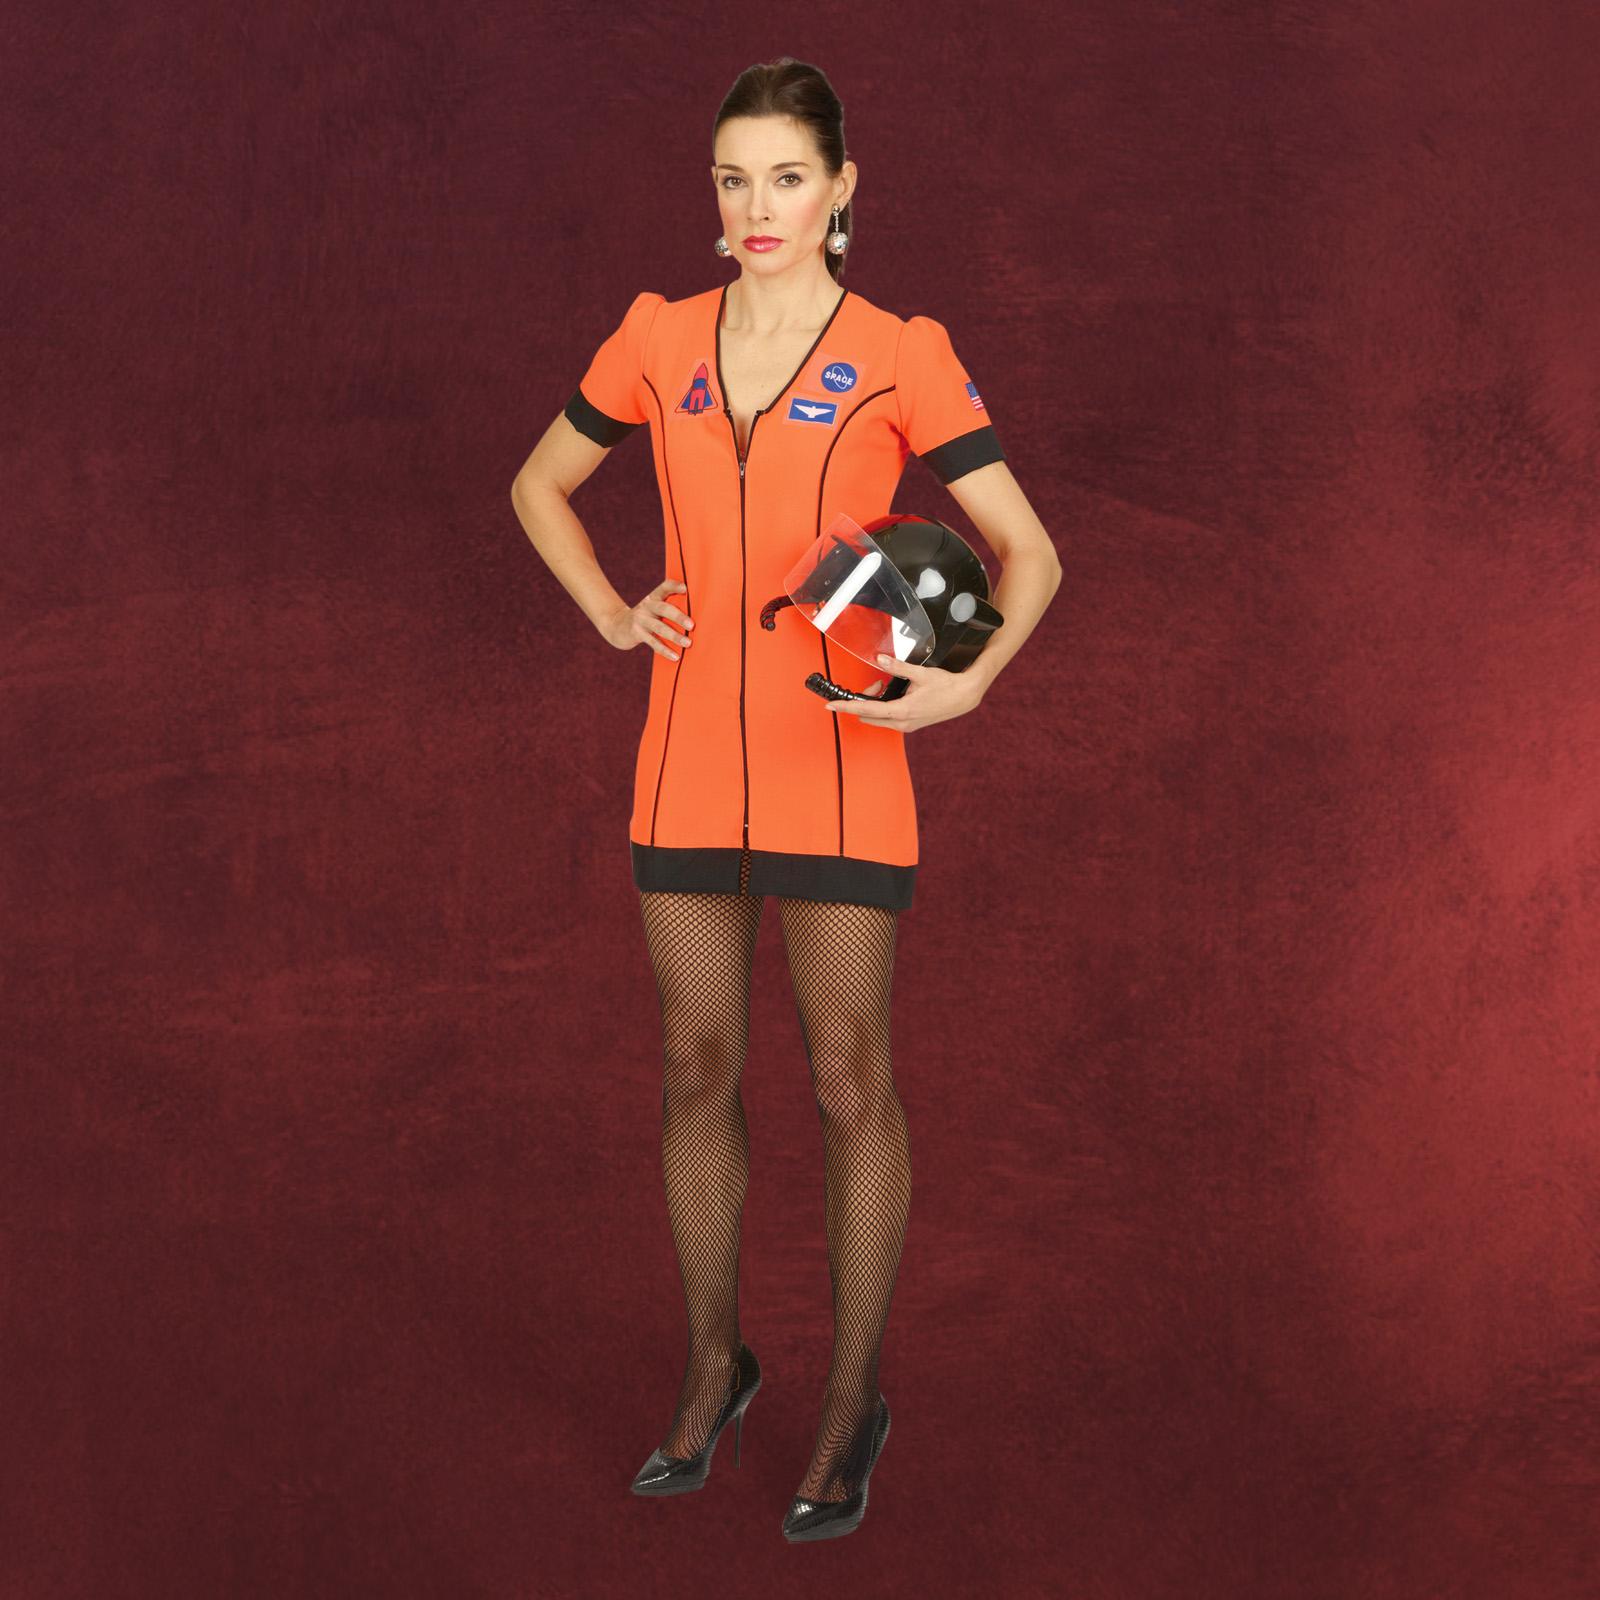 kostuem fasching astronautin raumfahrt karneval weltraum damen kleid mini orange ebay. Black Bedroom Furniture Sets. Home Design Ideas